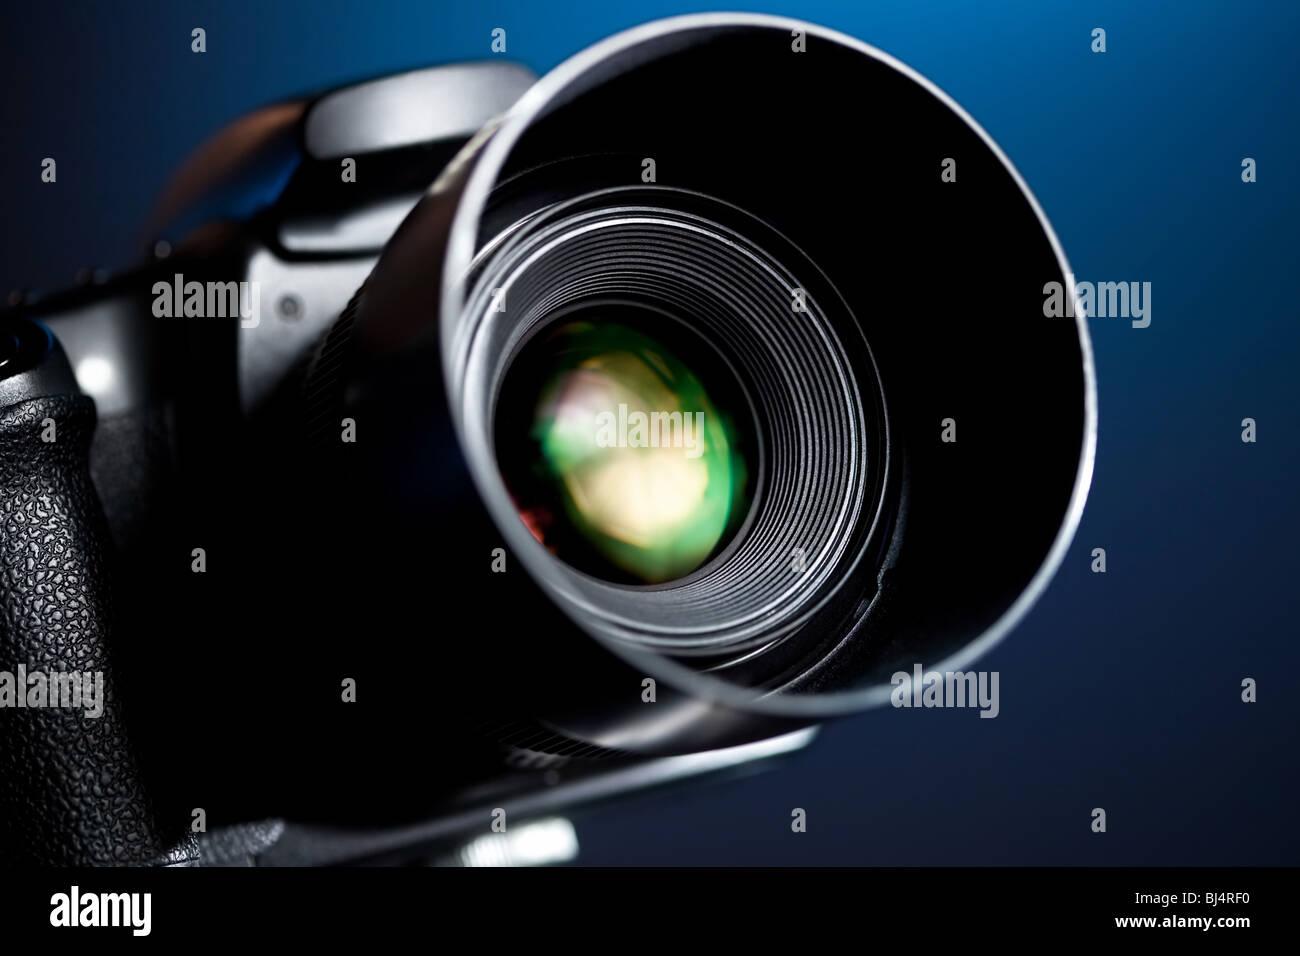 Professional DSLR camera on blue background. - Stock Image